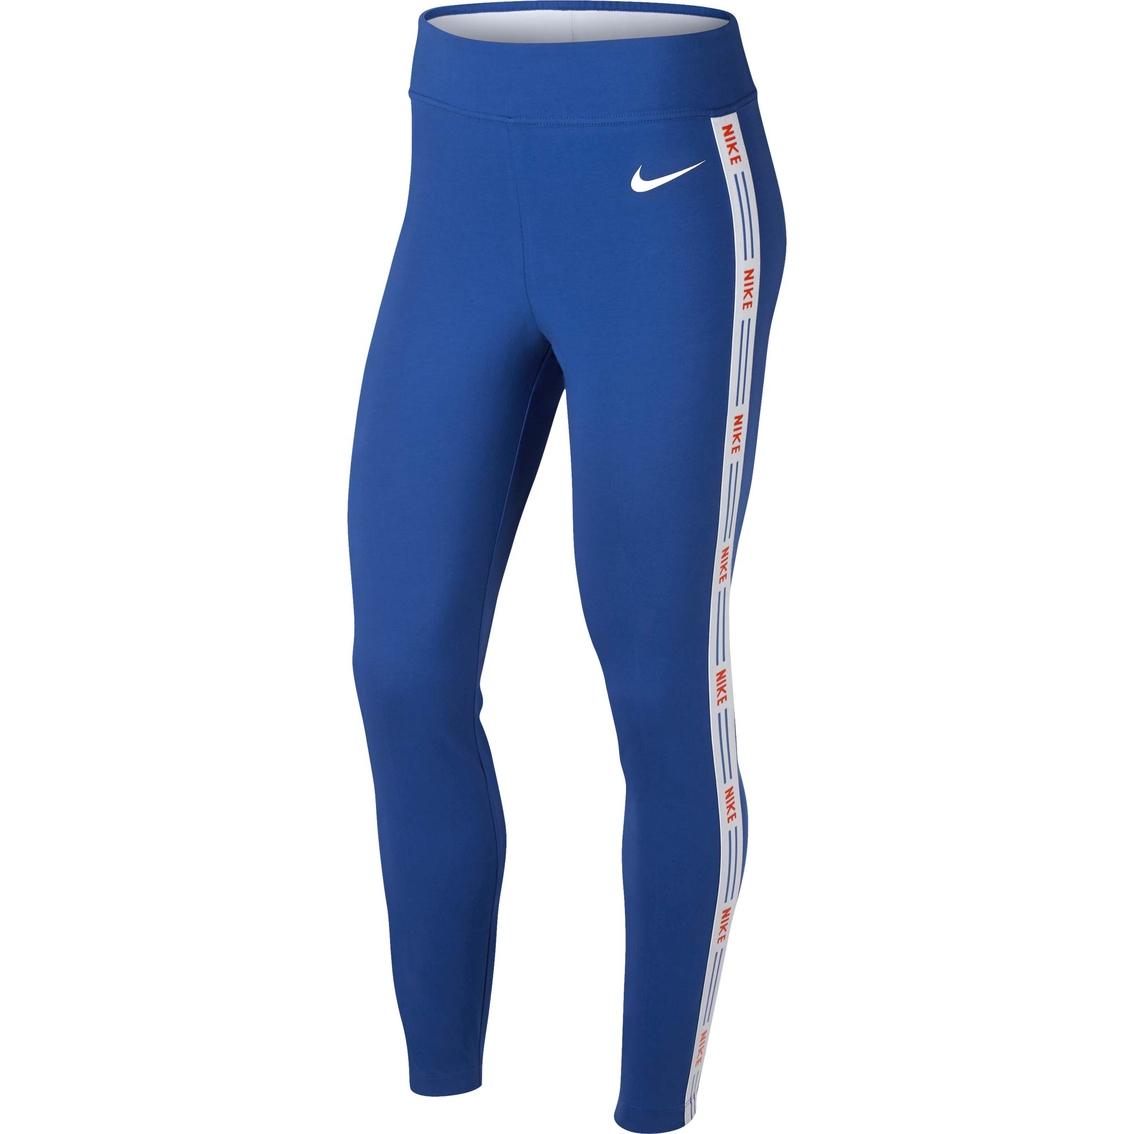 5a3a66dcc1976 Nike Sportswear Hyper Femme Leggings | Leggings | Apparel | Shop The ...